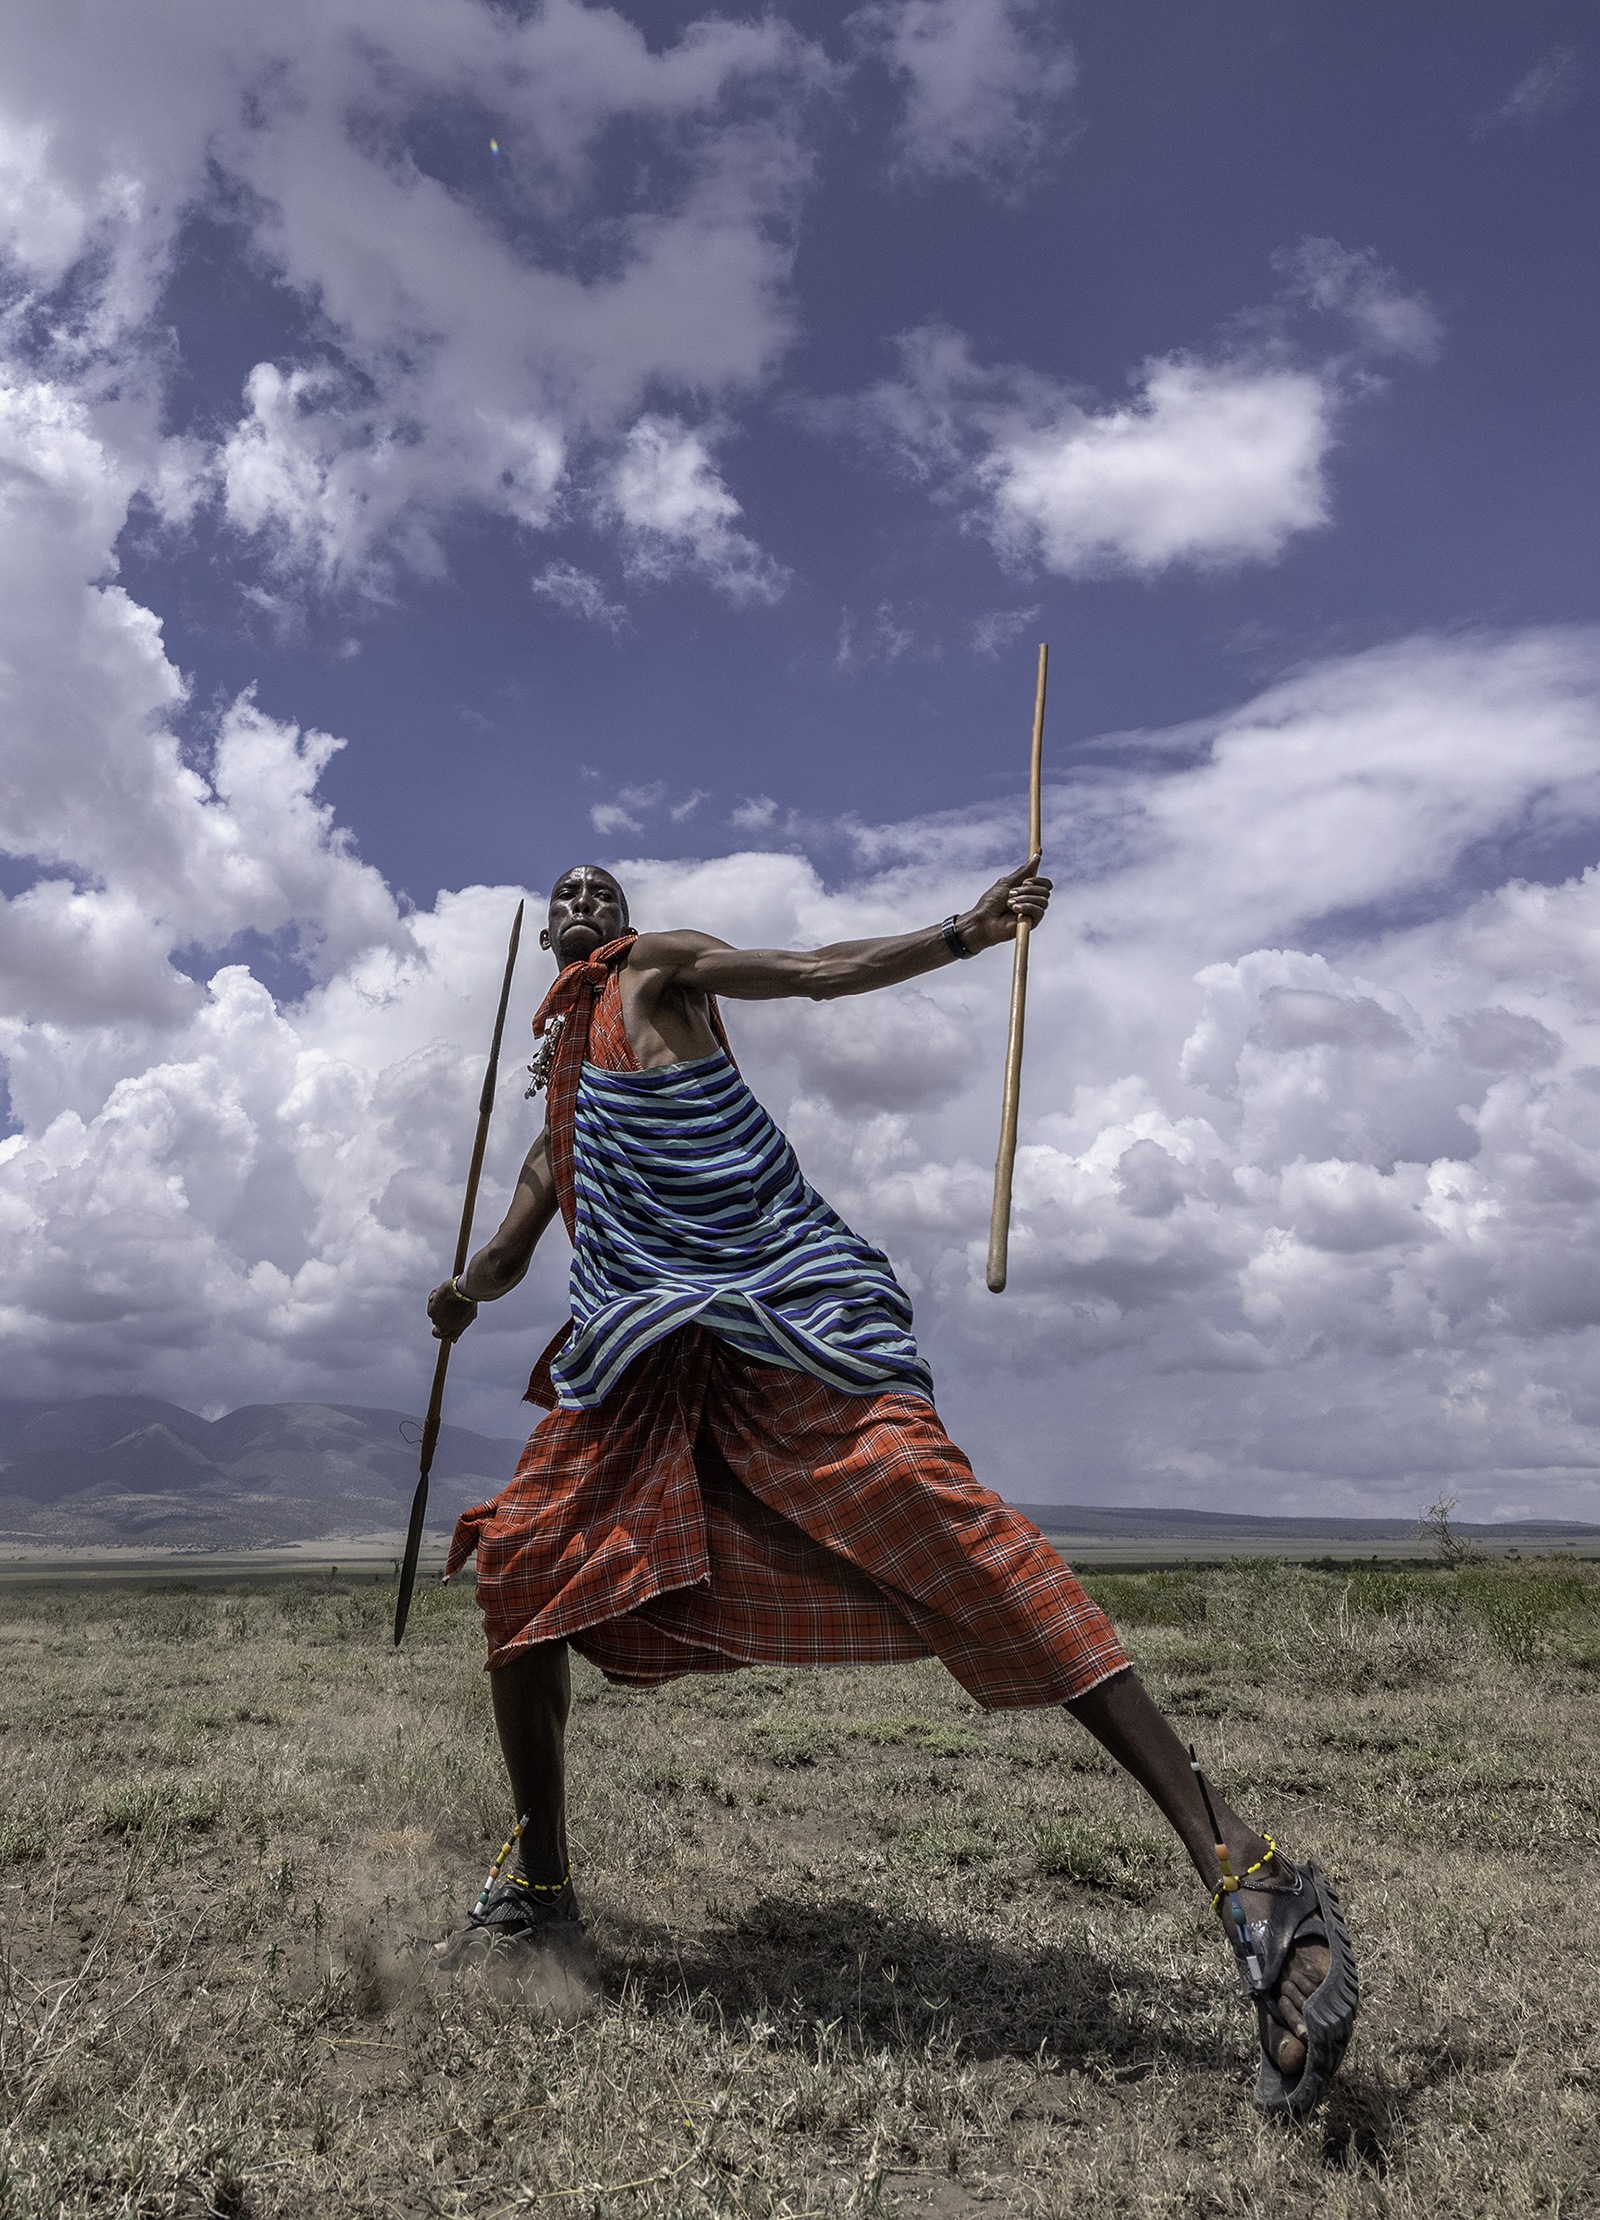 masai+spear+throwing+copy.jpg